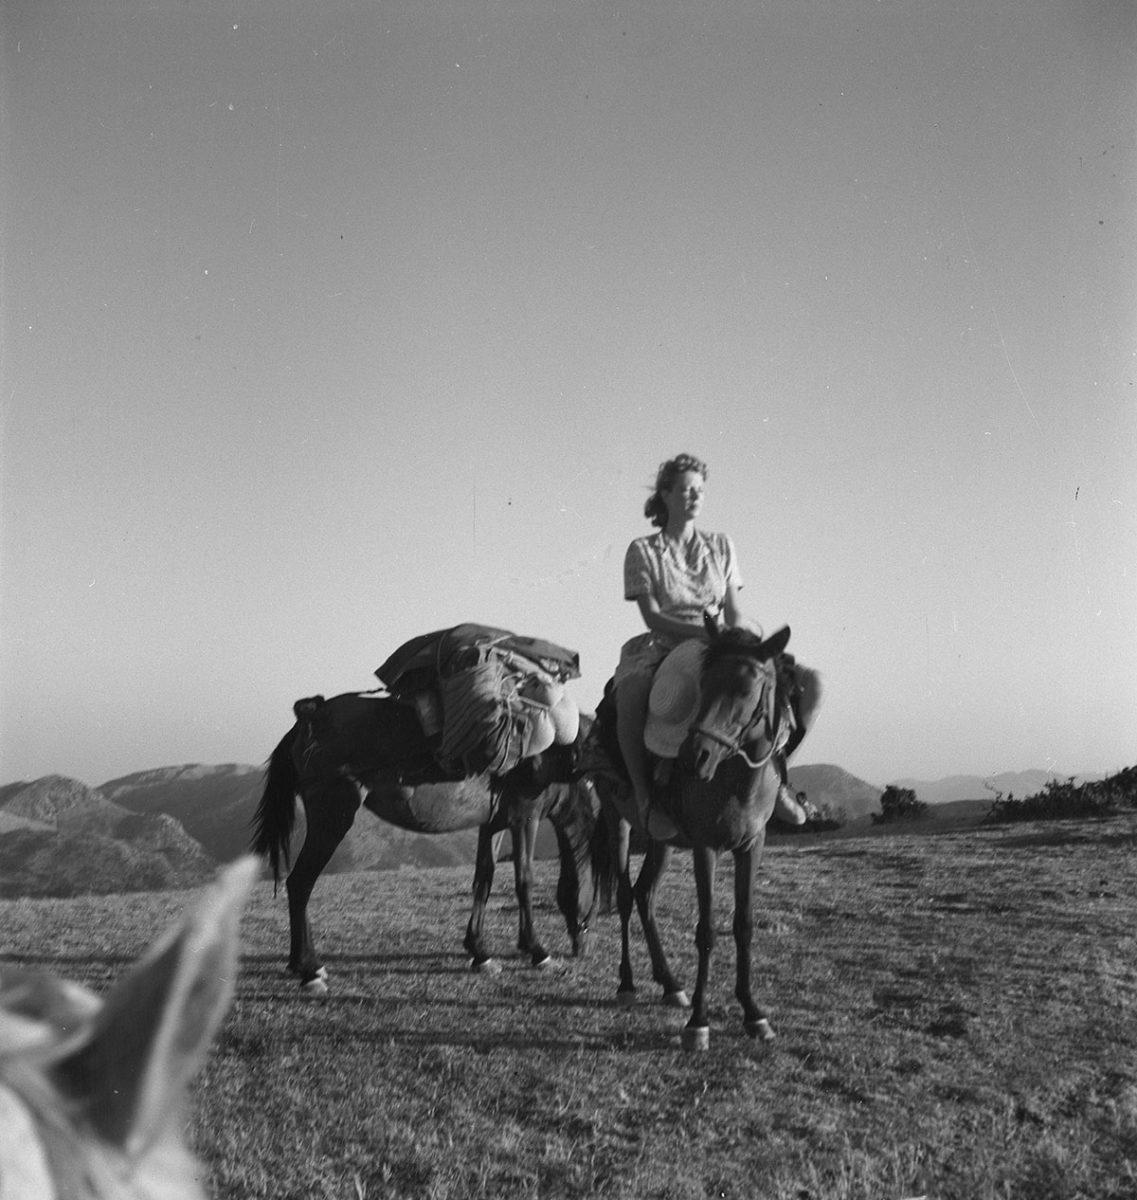 Joan Leigh Fermor on horseback. © Benaki Museum / The Ghika Gallery, Photographic Archive